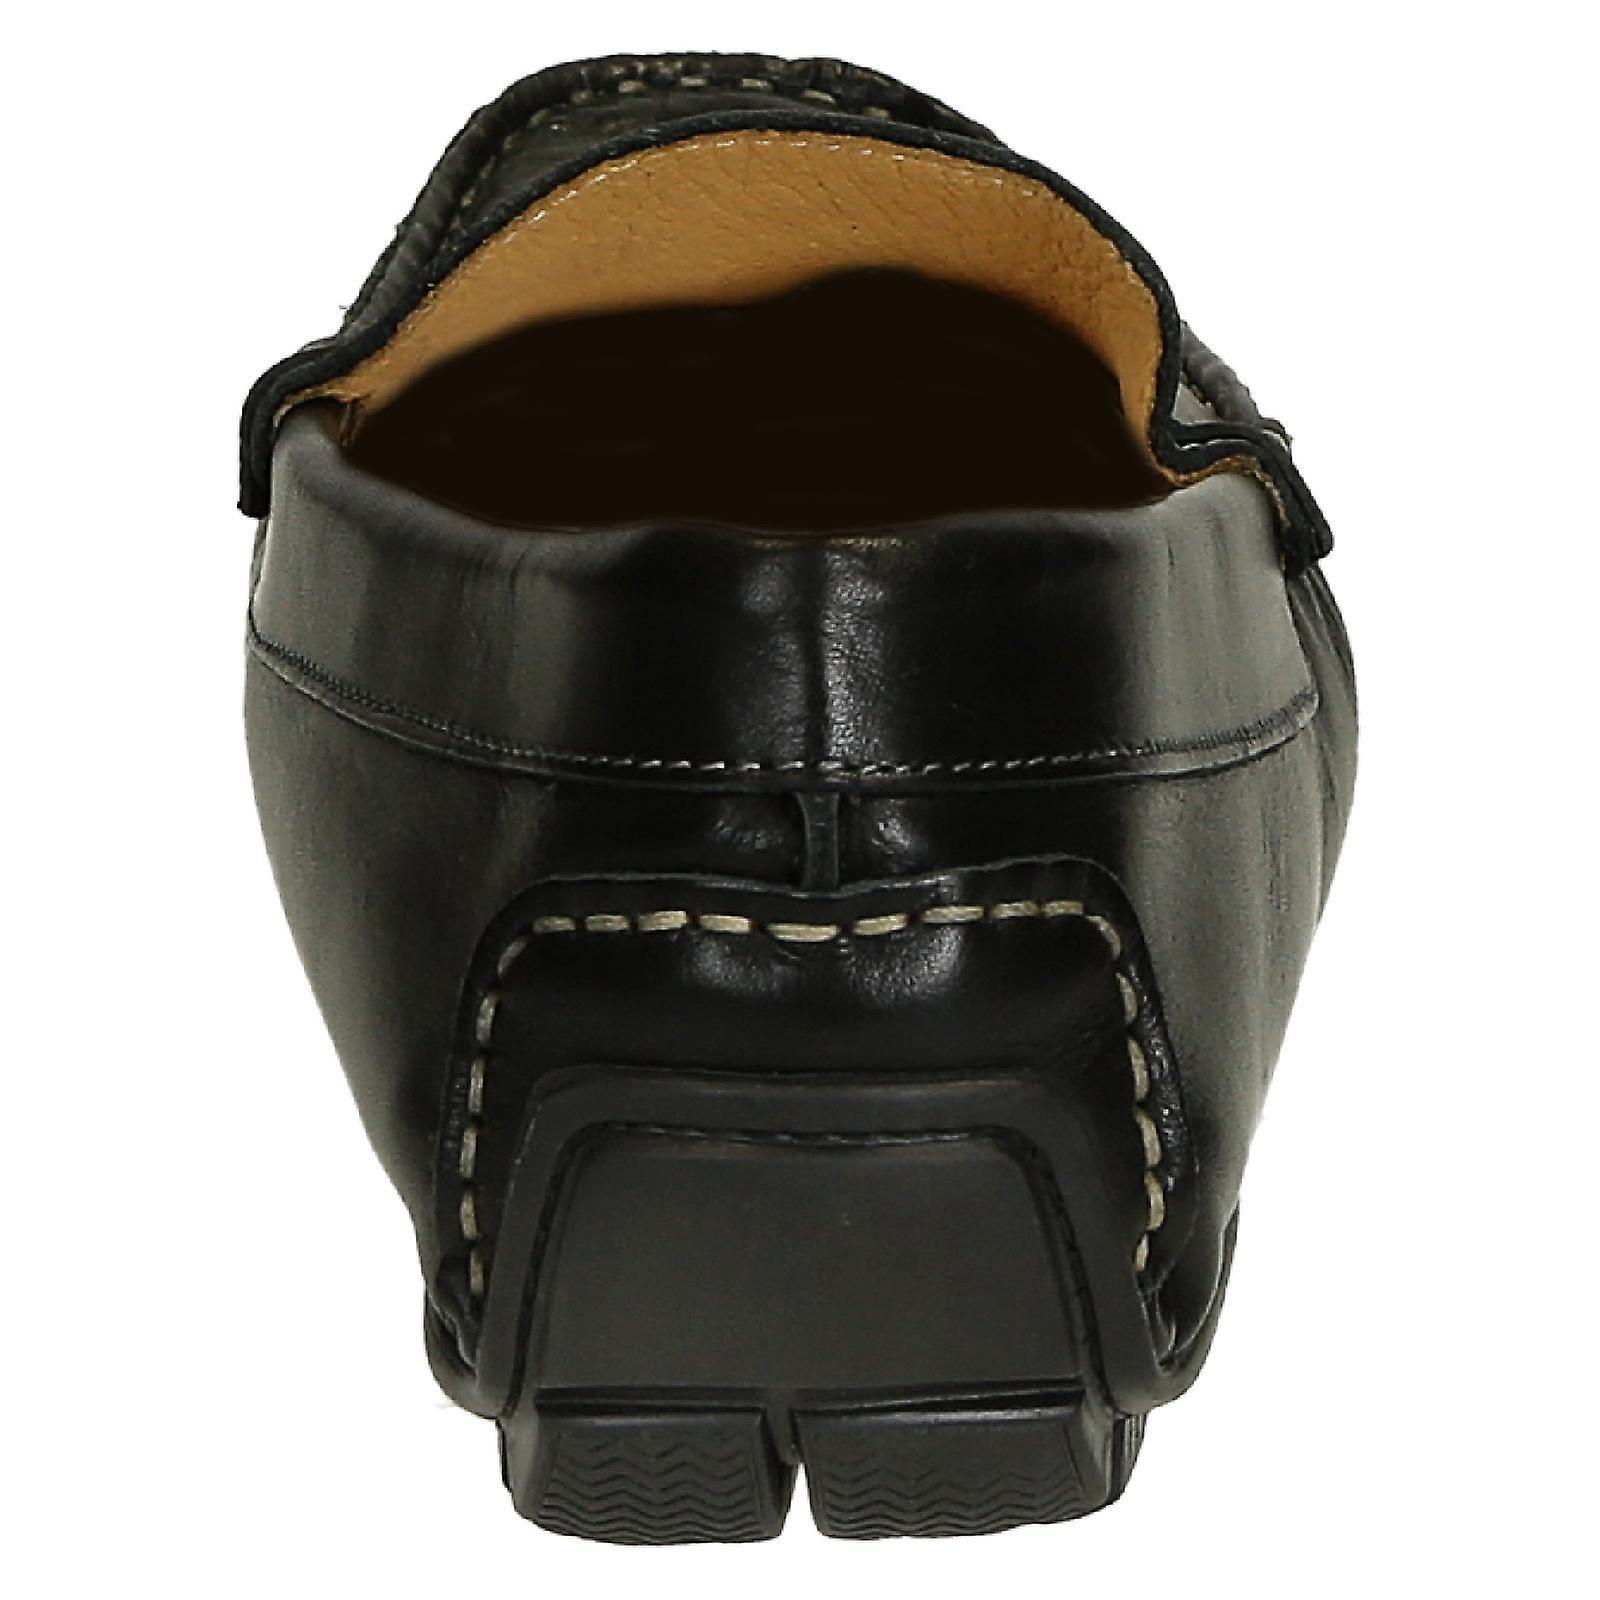 Black calf leather men's italian driving moccasins